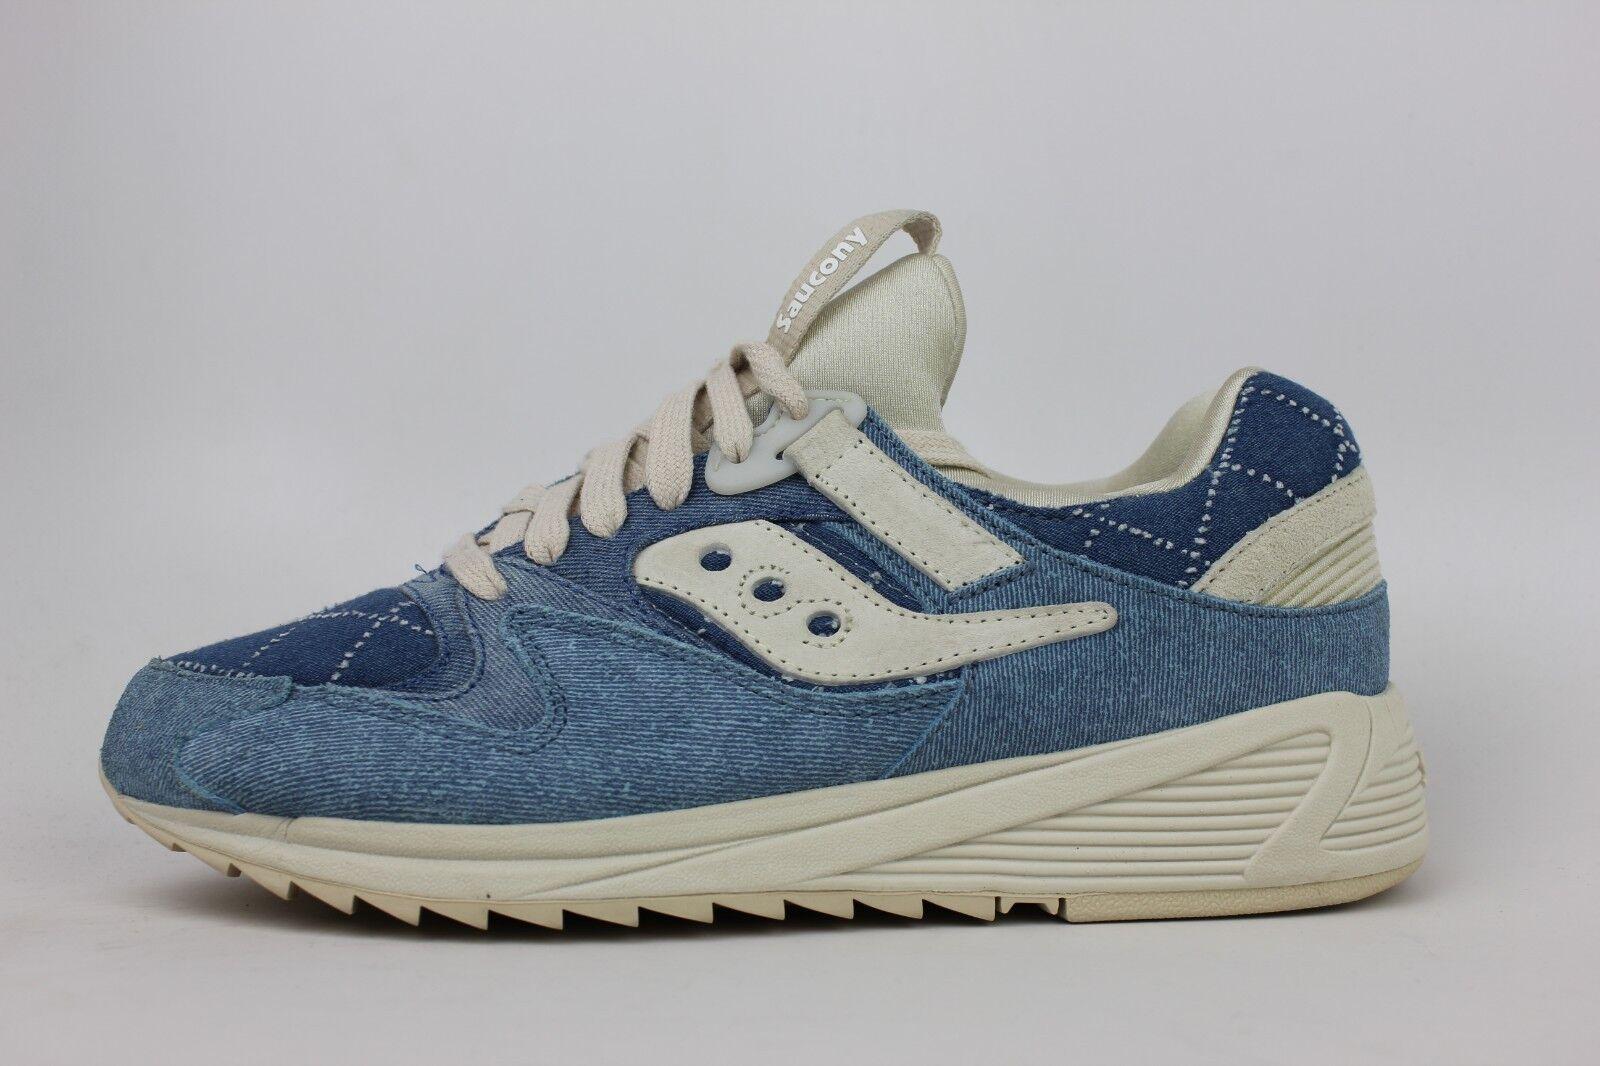 SAUCONYGRID 8500 BORO BLUE DENIM WHITE Uomo SIZE RUNNING SNEAKERS S70343-2